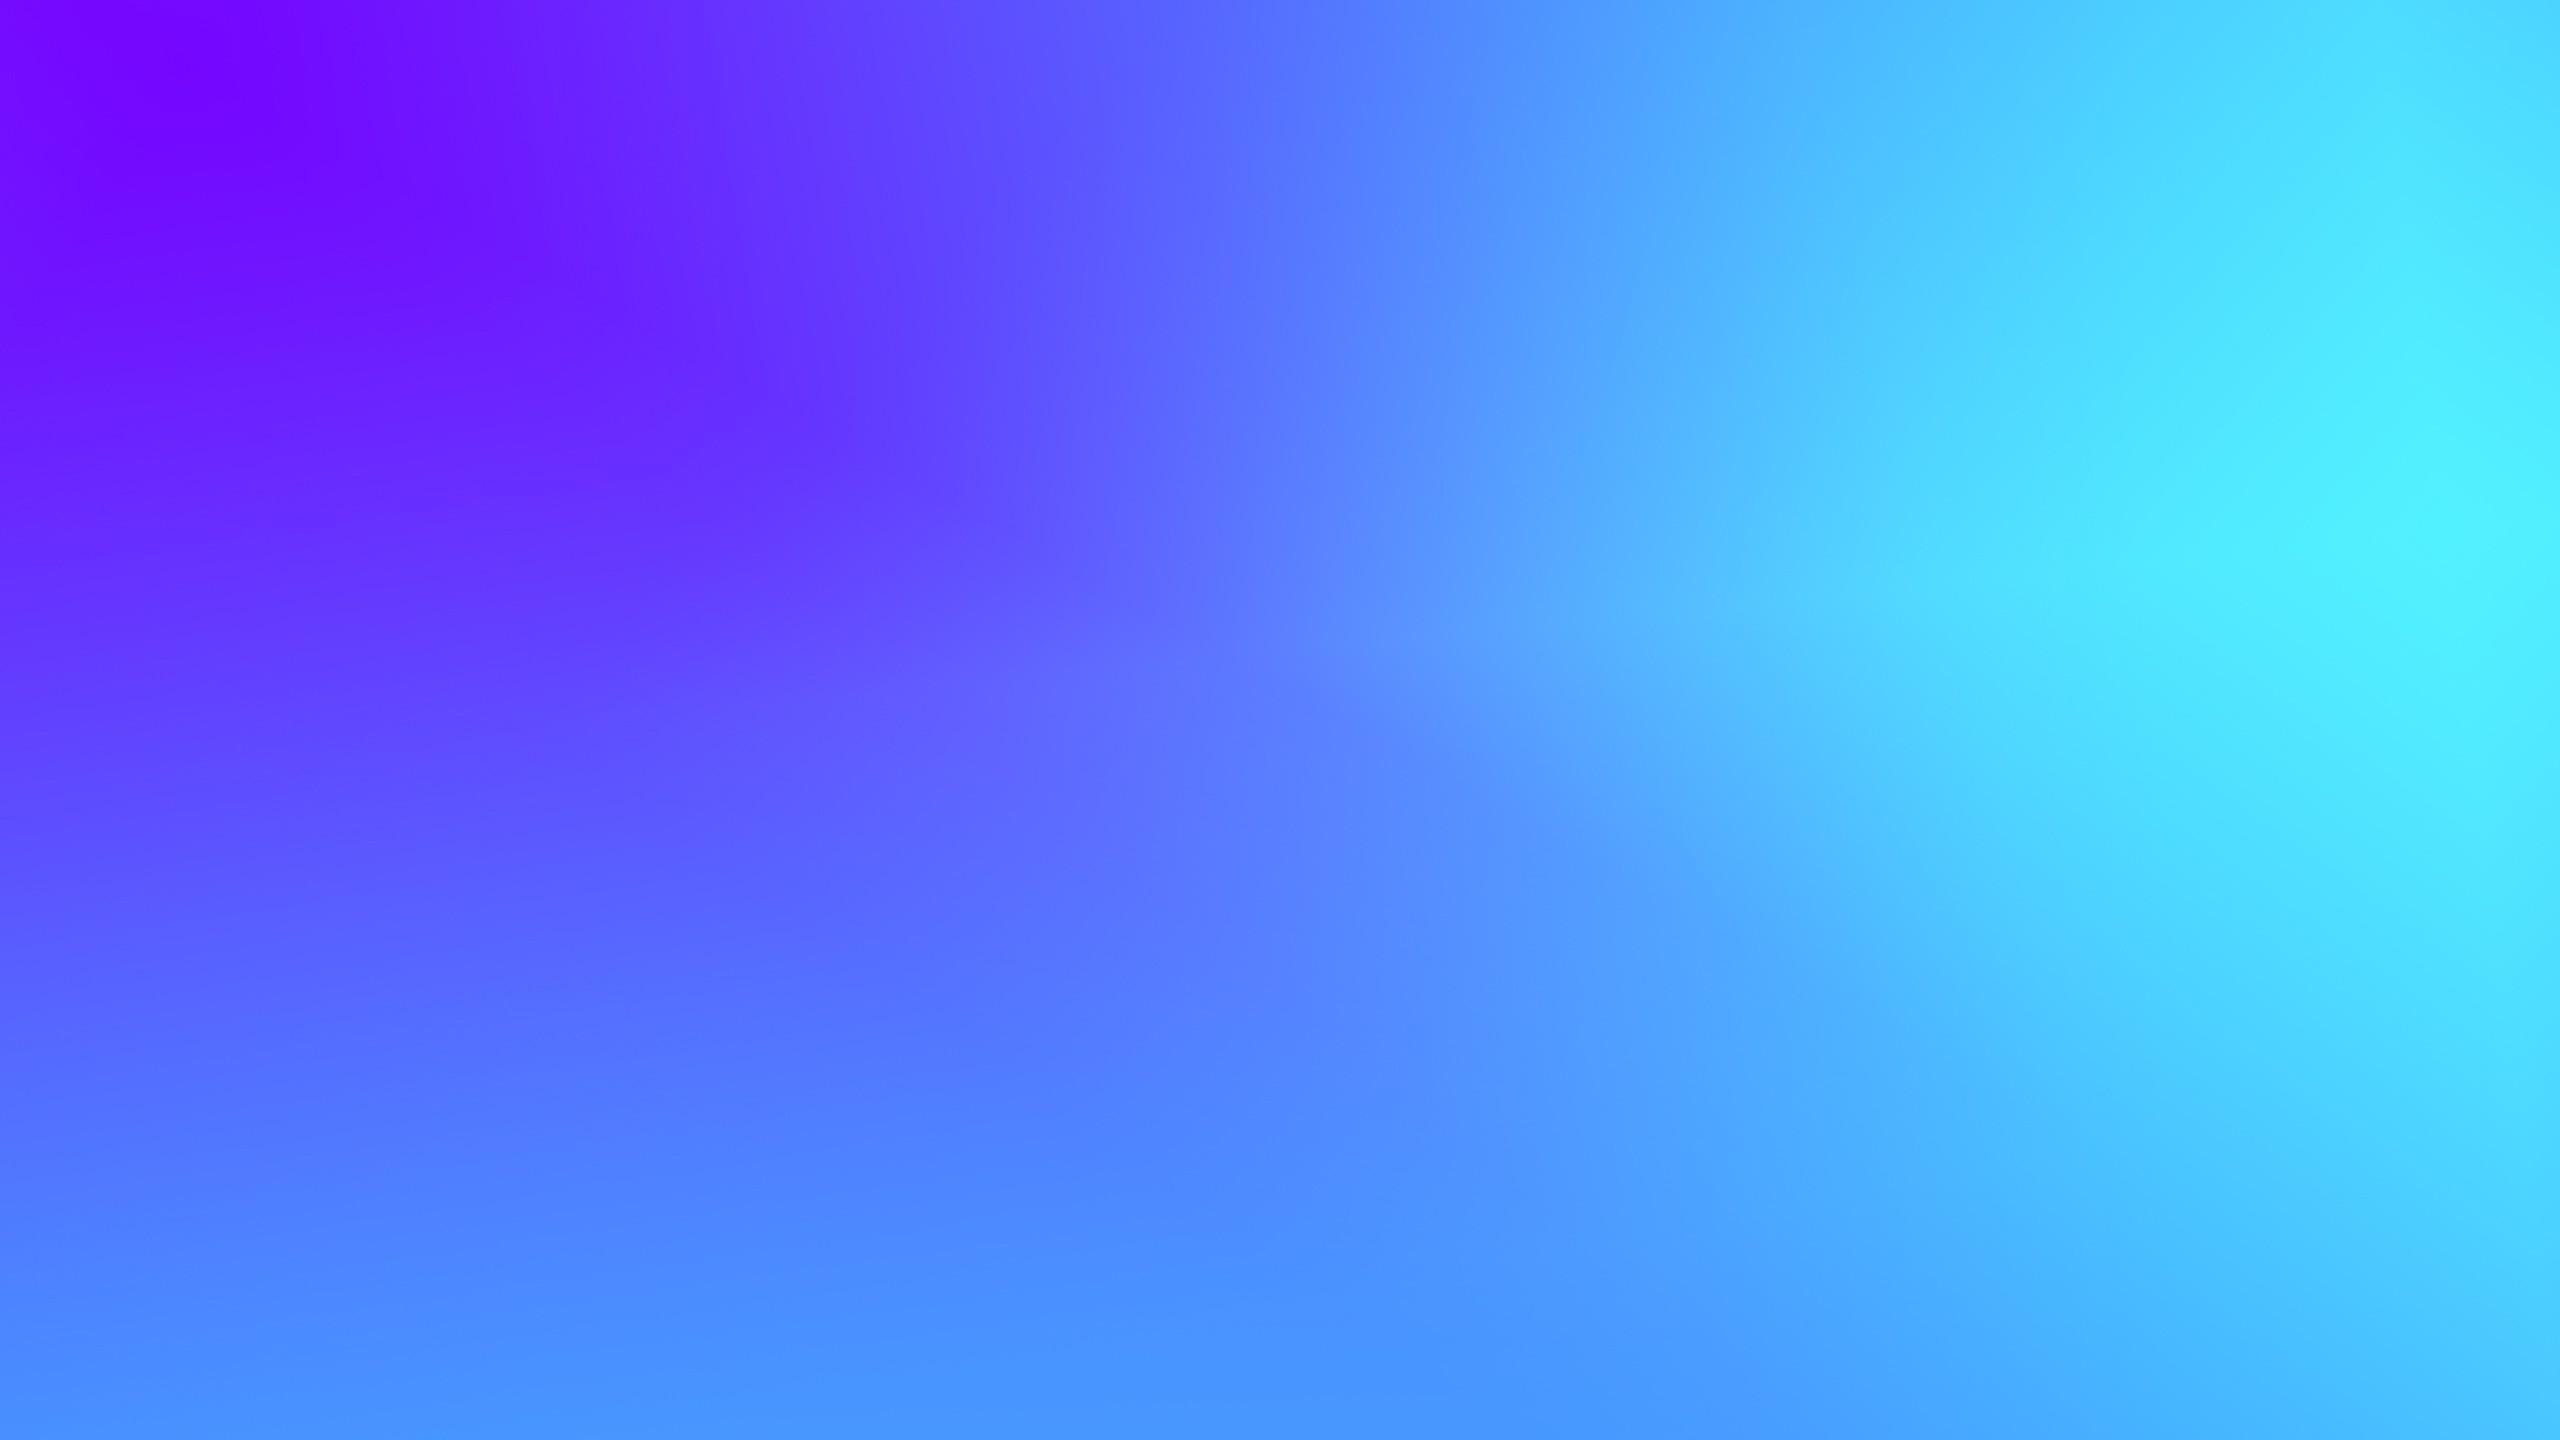 1280x800 Hd Wallpaper 3d Blue Wallpaper 2560x1440 55557